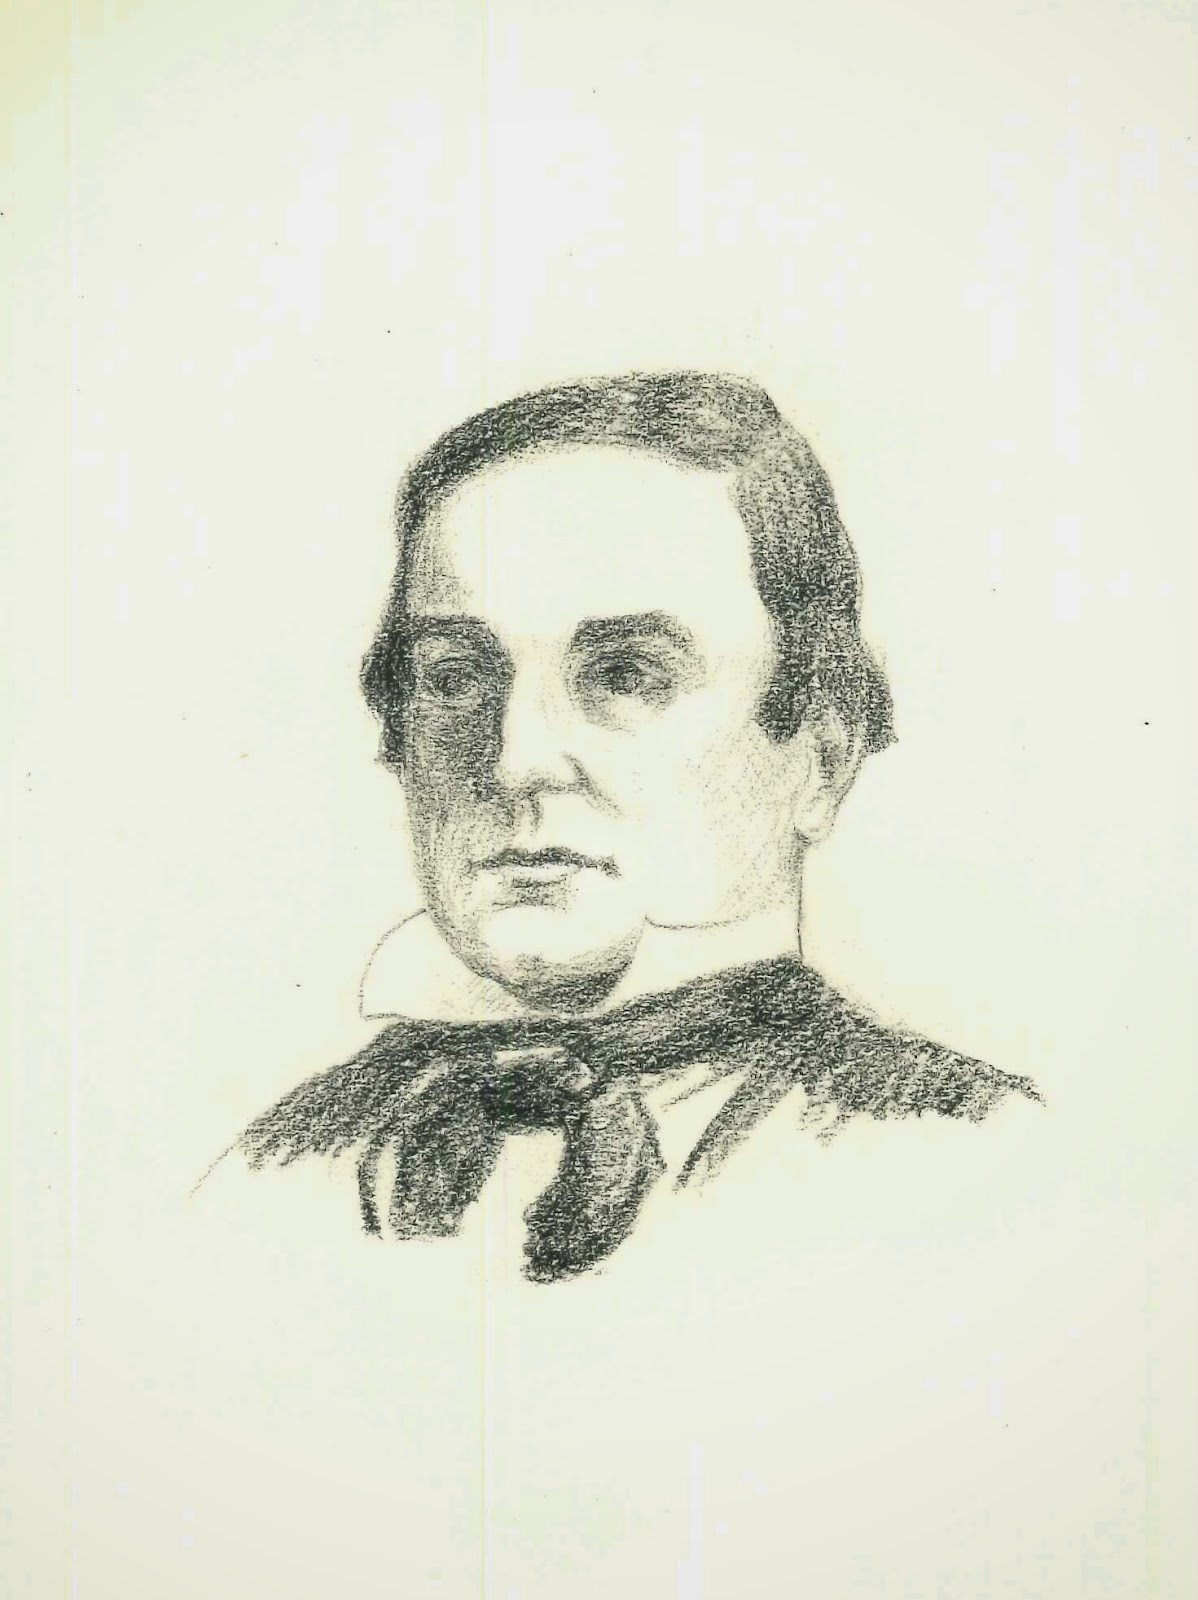 A sketch of Morey.